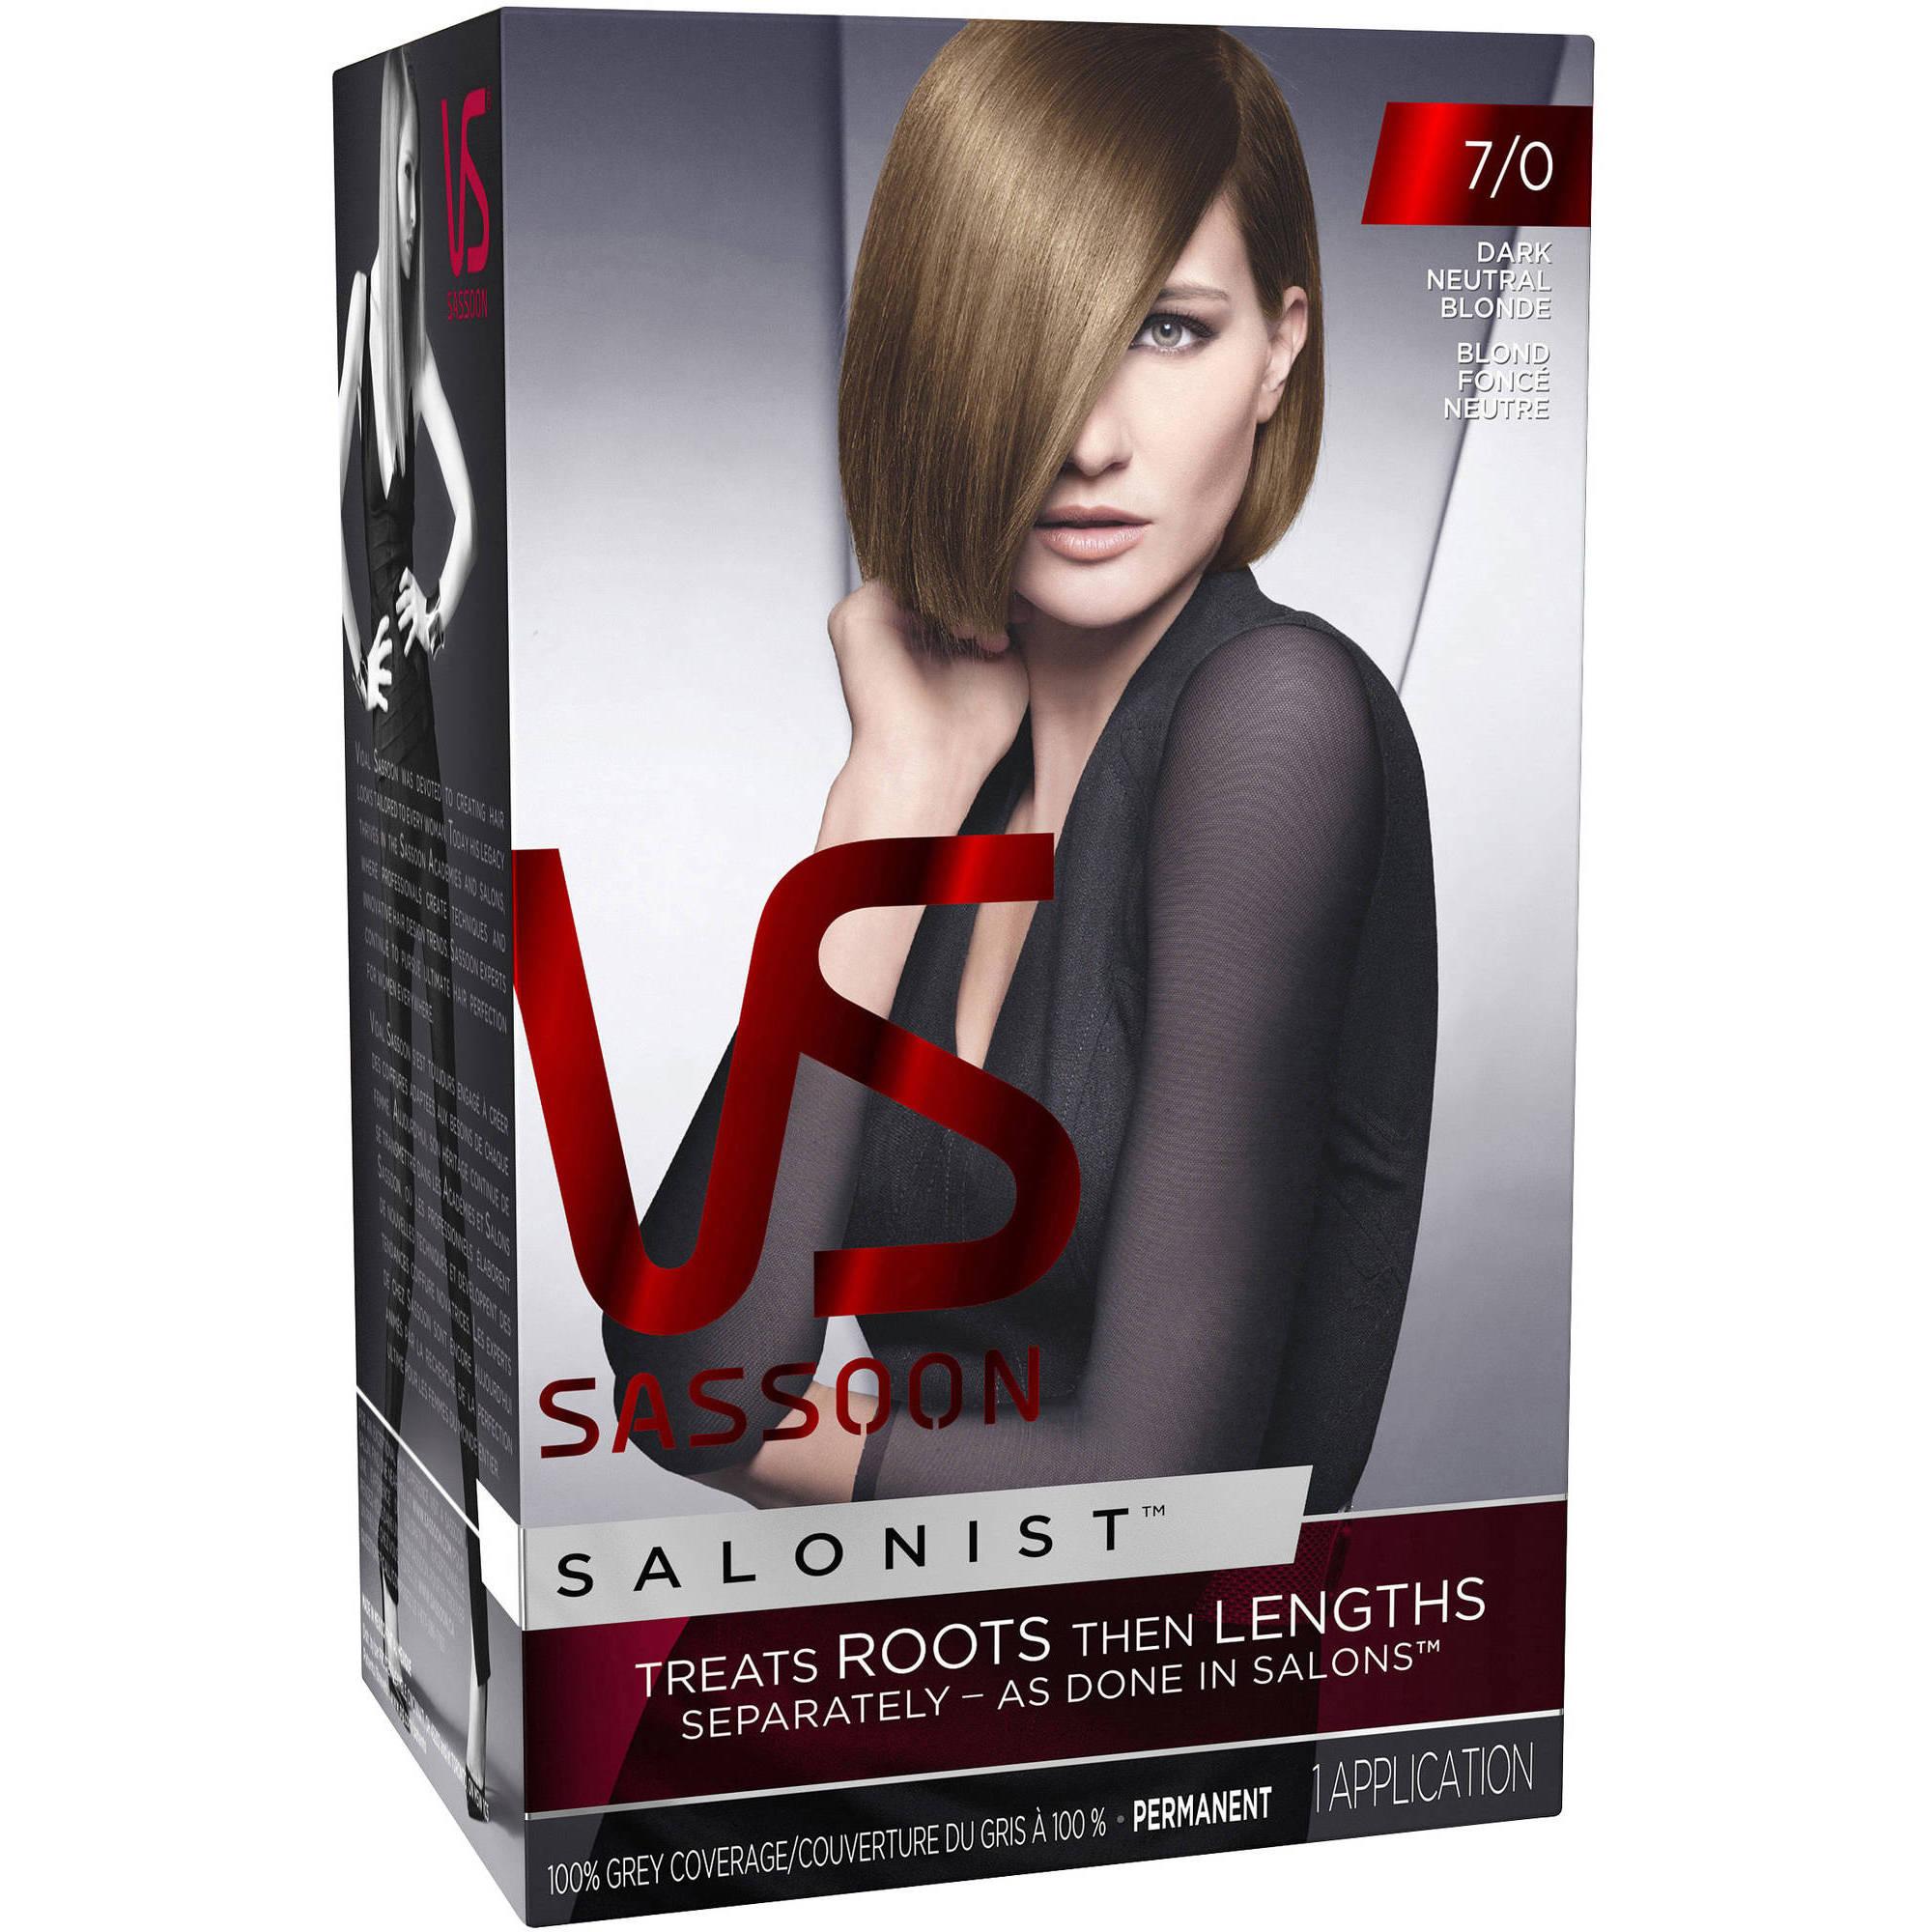 Vidal Sassoon Salonist Hair Color (Choose your Color)